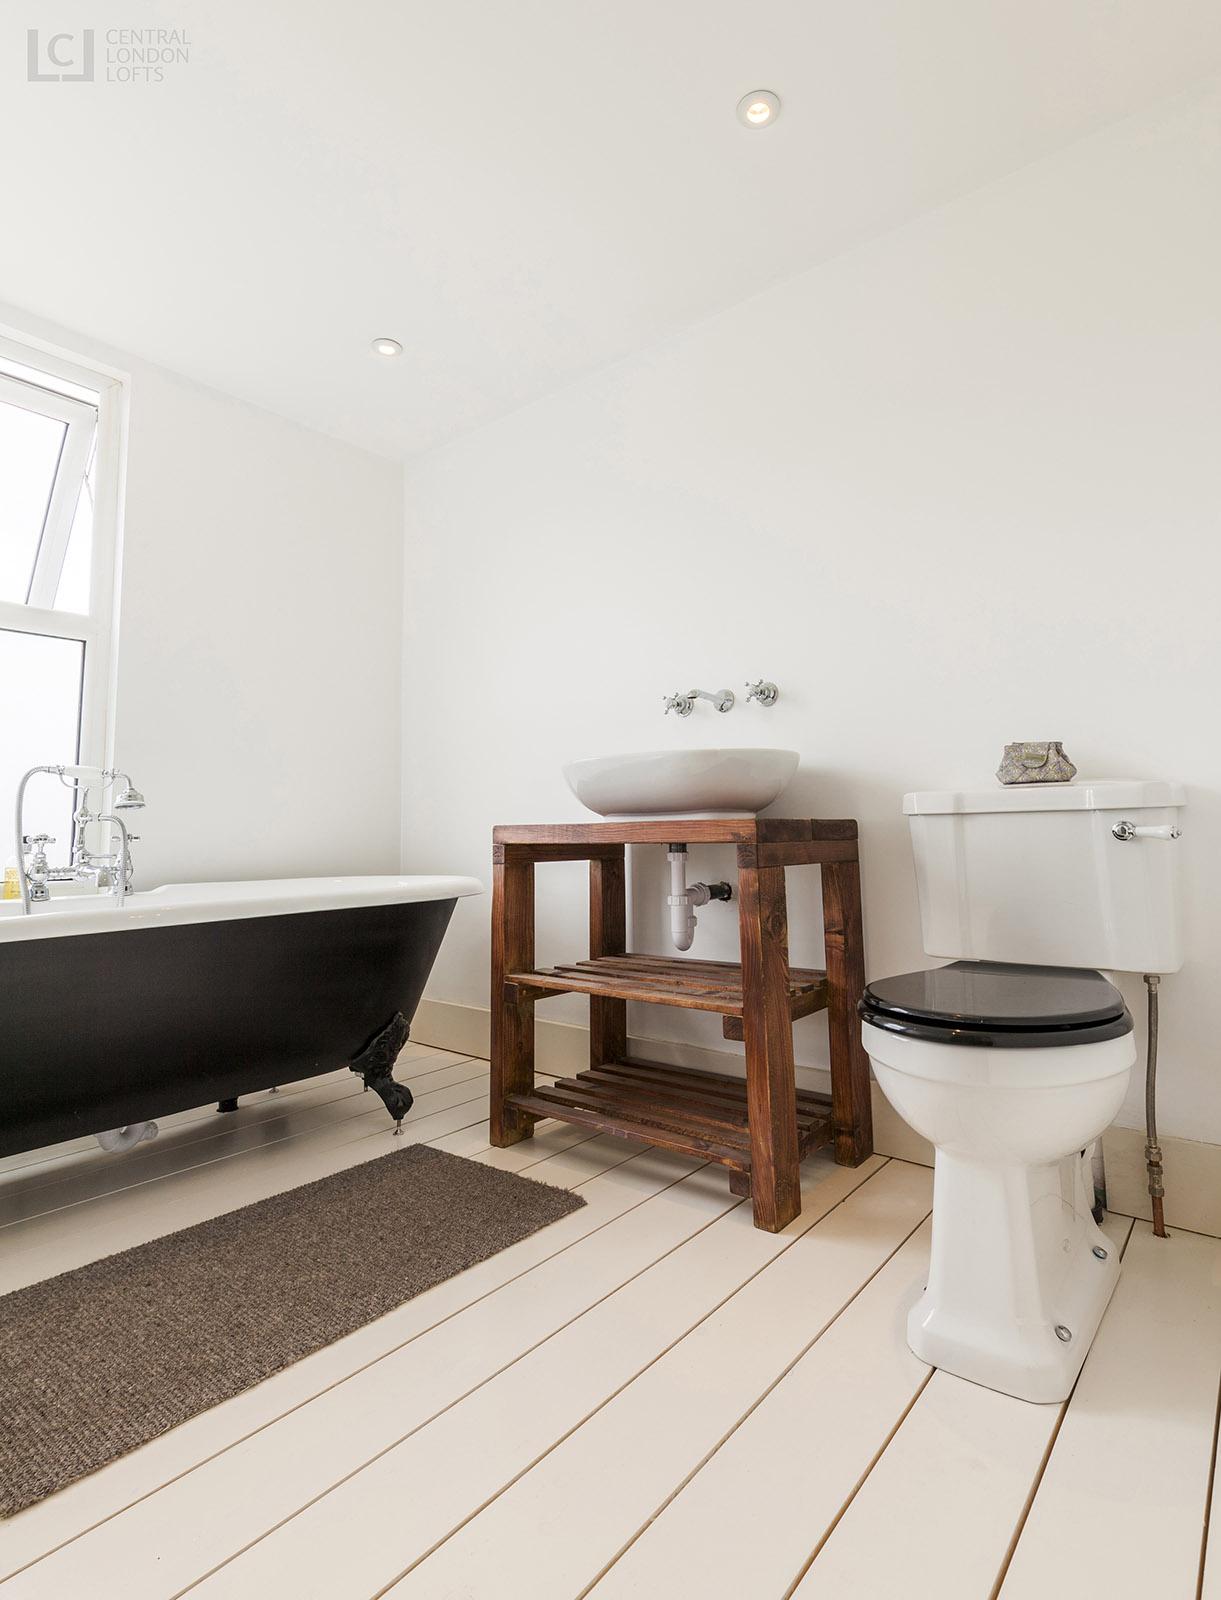 Lewisham loft conversion ensuite bathroom